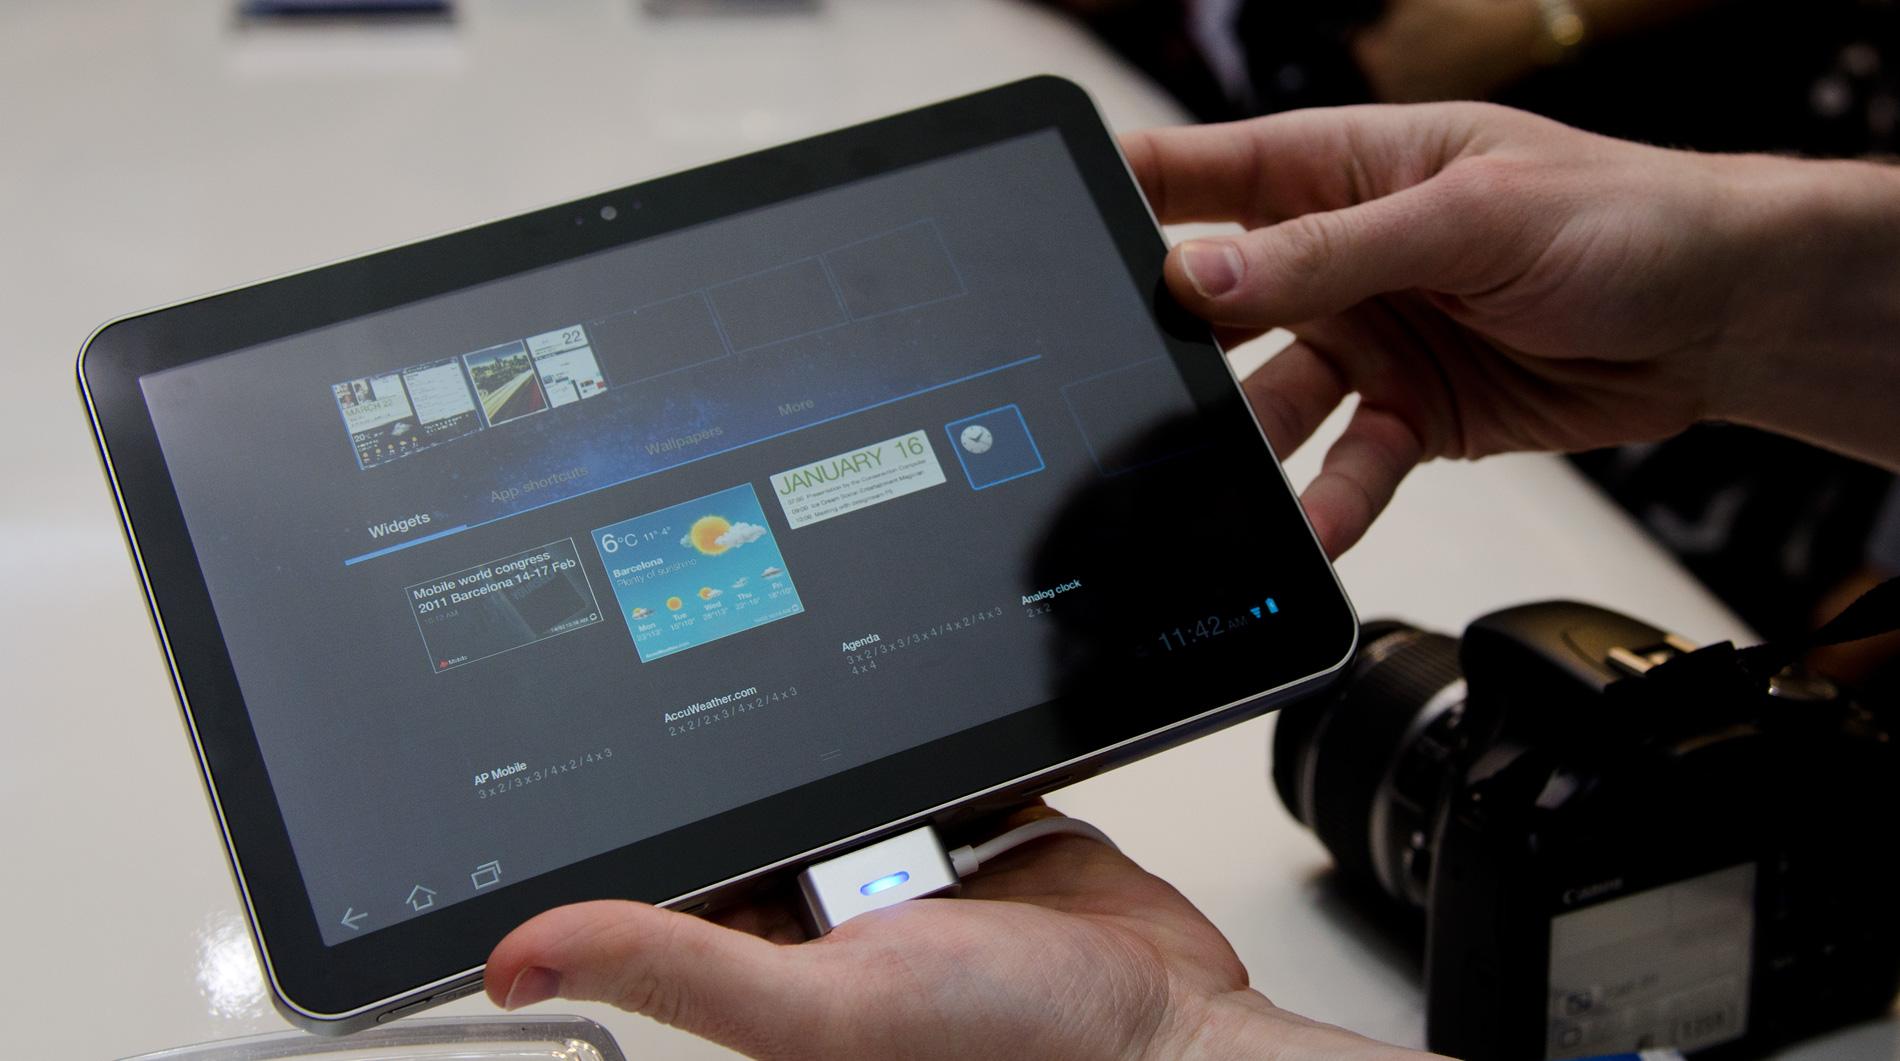 Samsung's Galaxy Tab 10.1 & 8.9, Smaller than iPad 2 ...